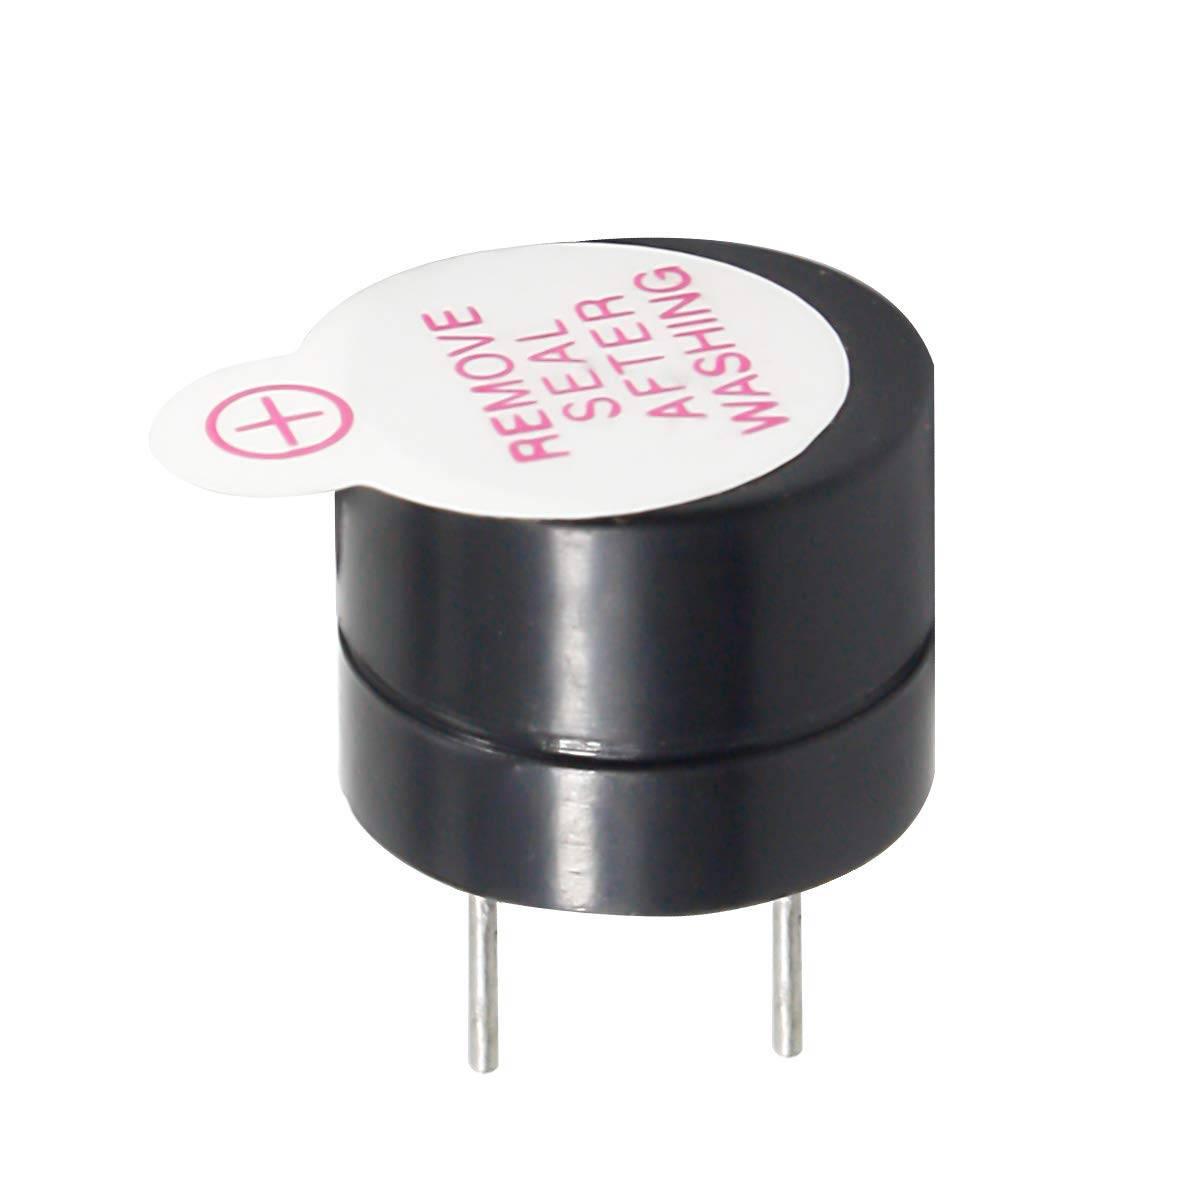 Electromagnetic Buzzer PCB Mount 12V